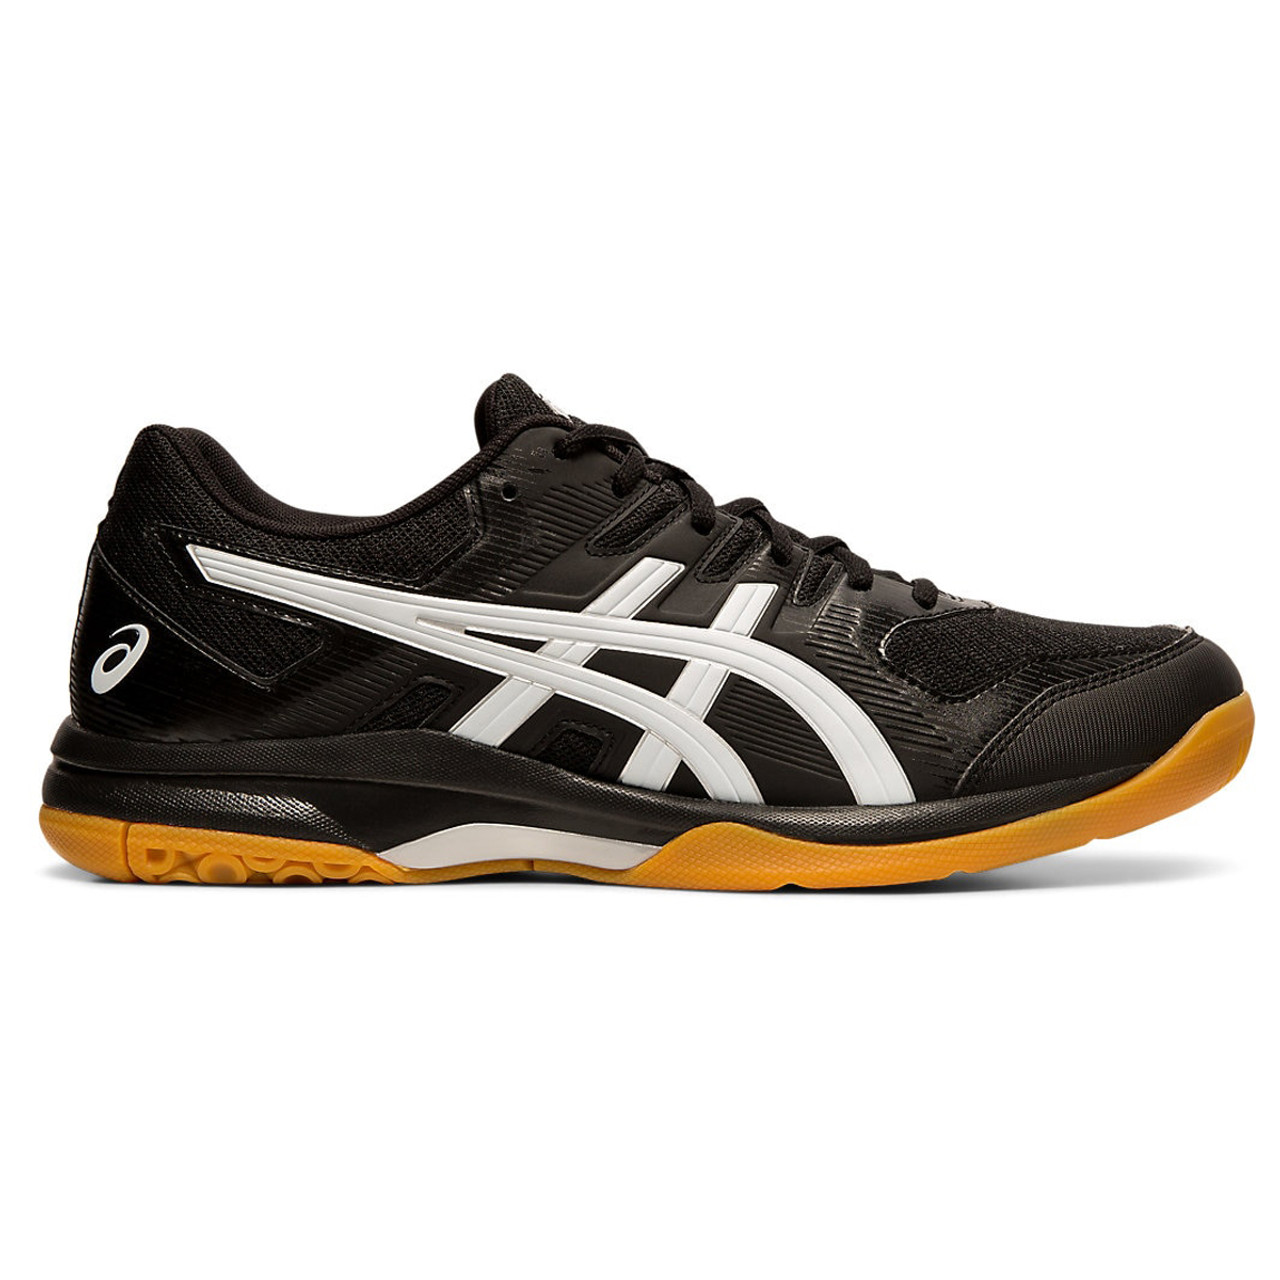 Asics Gel-Rocket Men's Volleyball Shoes